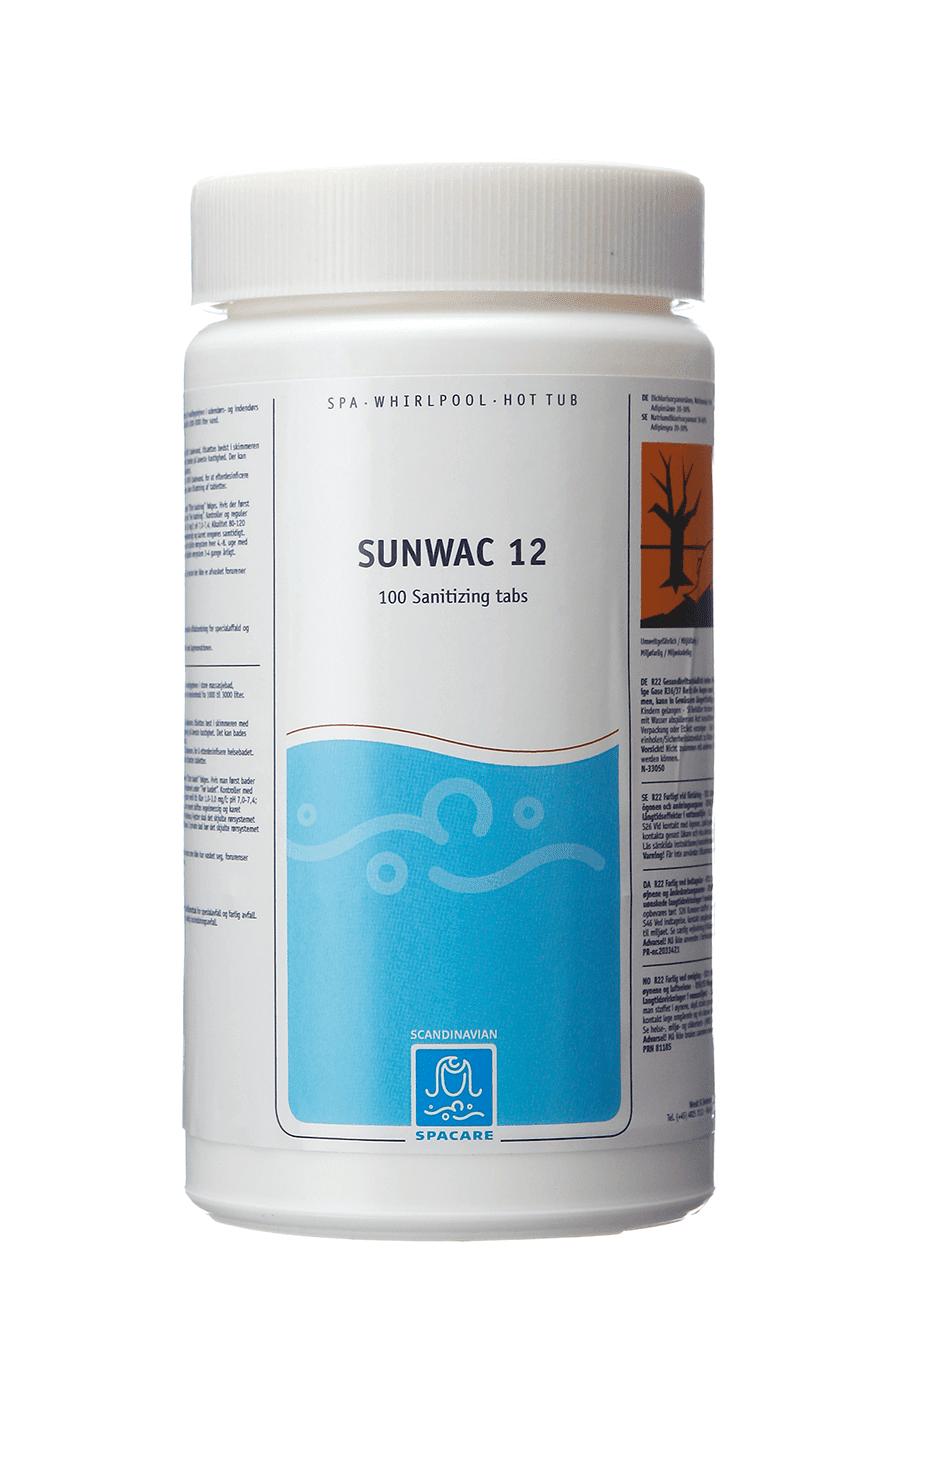 SpaCare SunWac 12